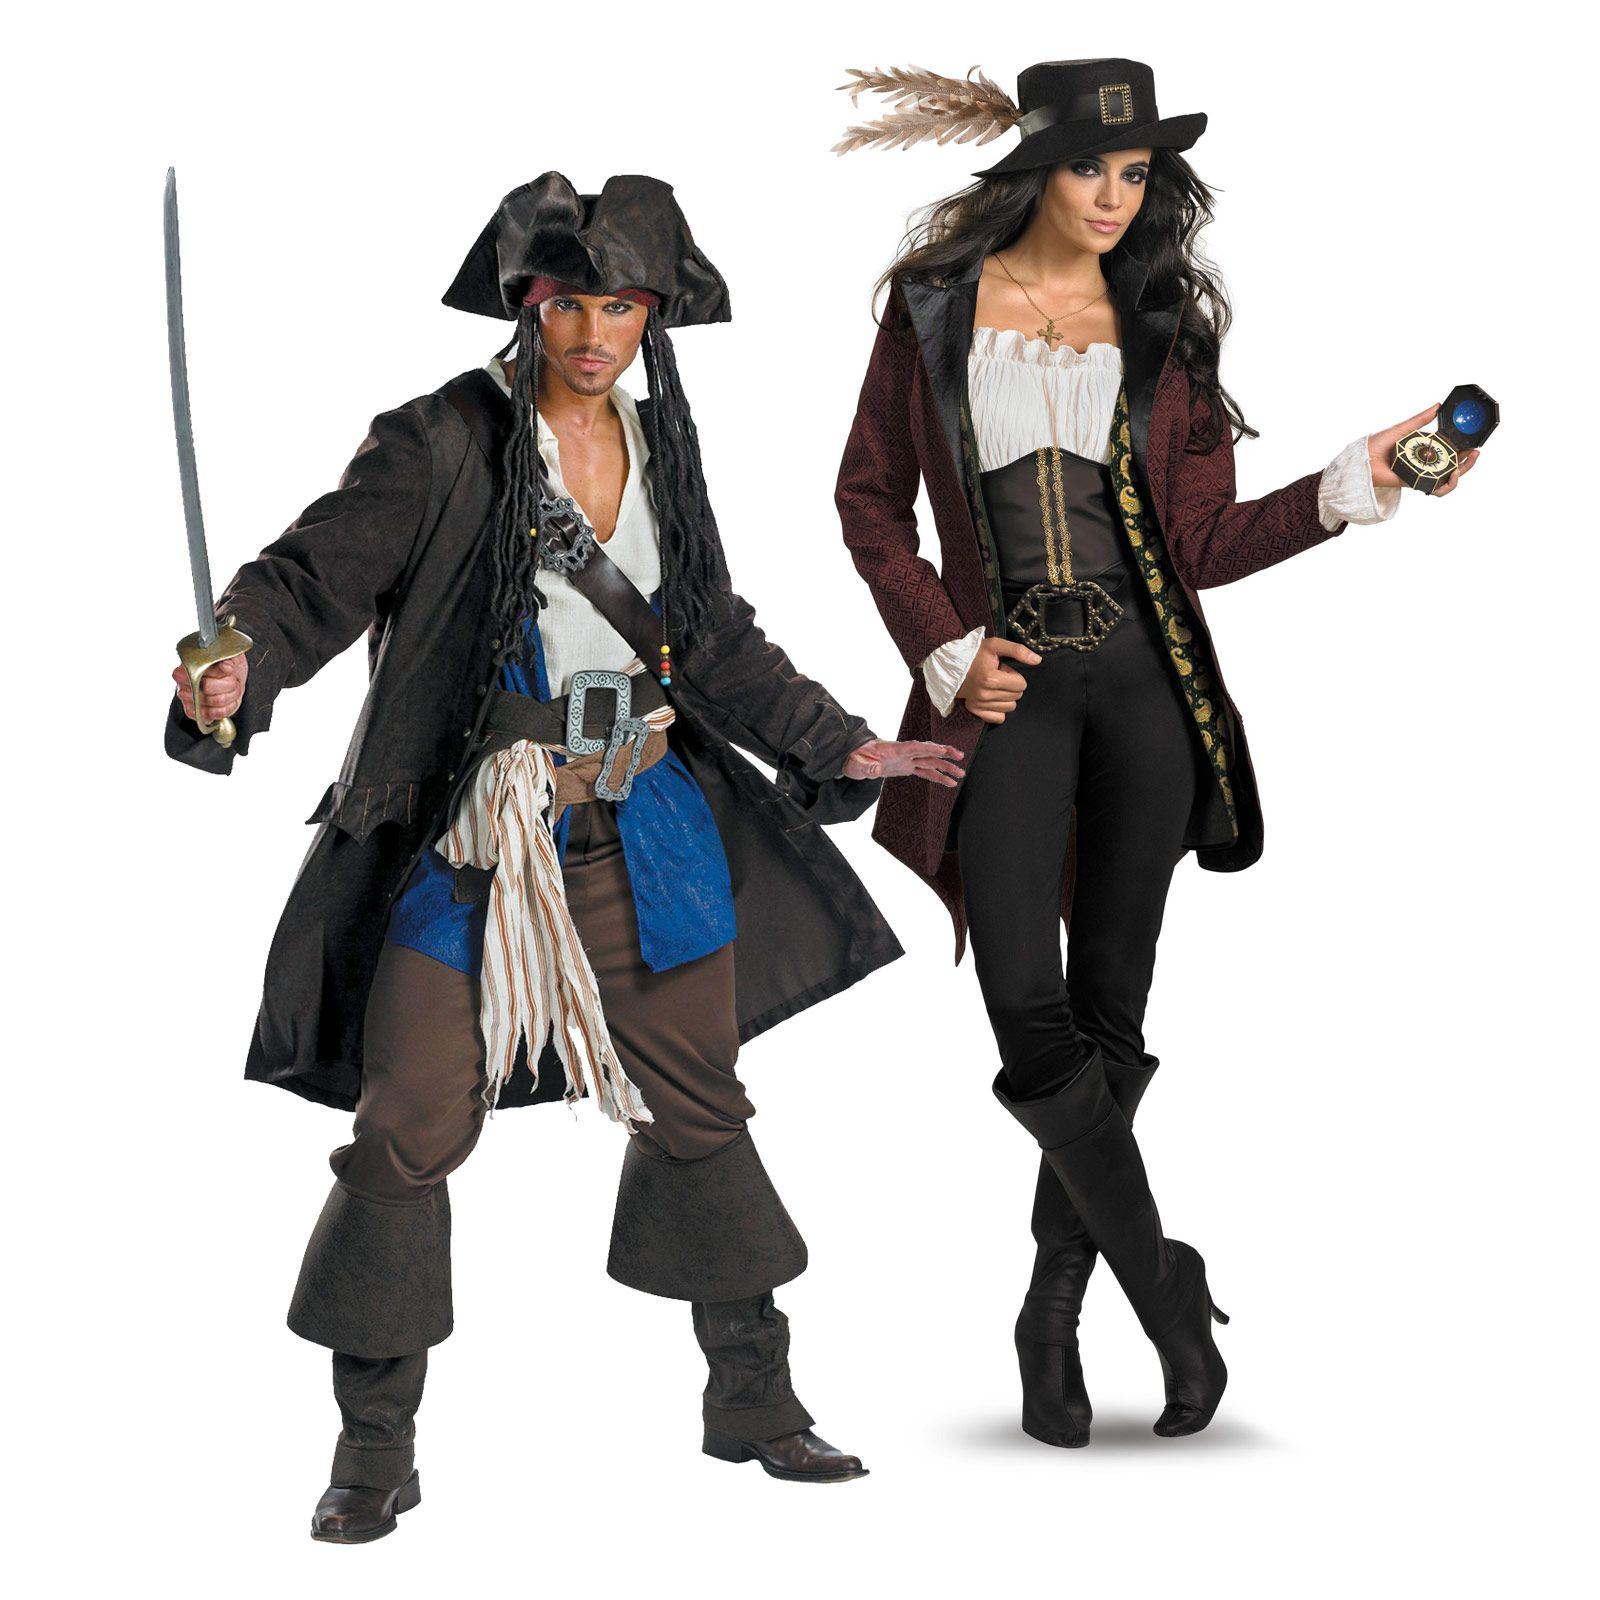 Robin Hood & Maid Marion Halloween couples costume idea | Top ...